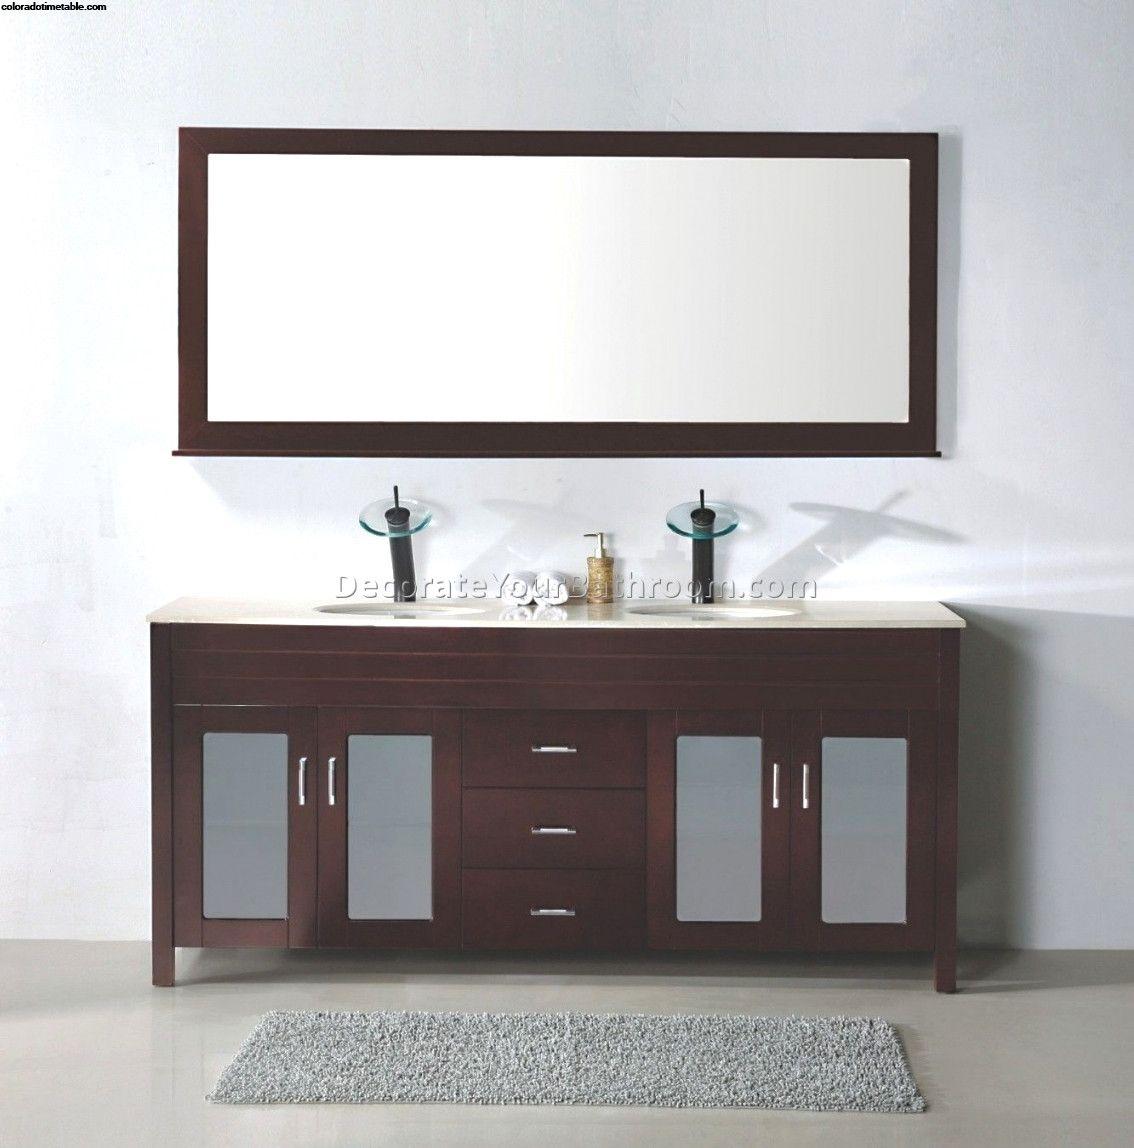 50 Bathroom Supply Stores Near Me Bu8t Beautiful Bathroom Vanity Bathroom Vanity Buy Bathroom Vanity